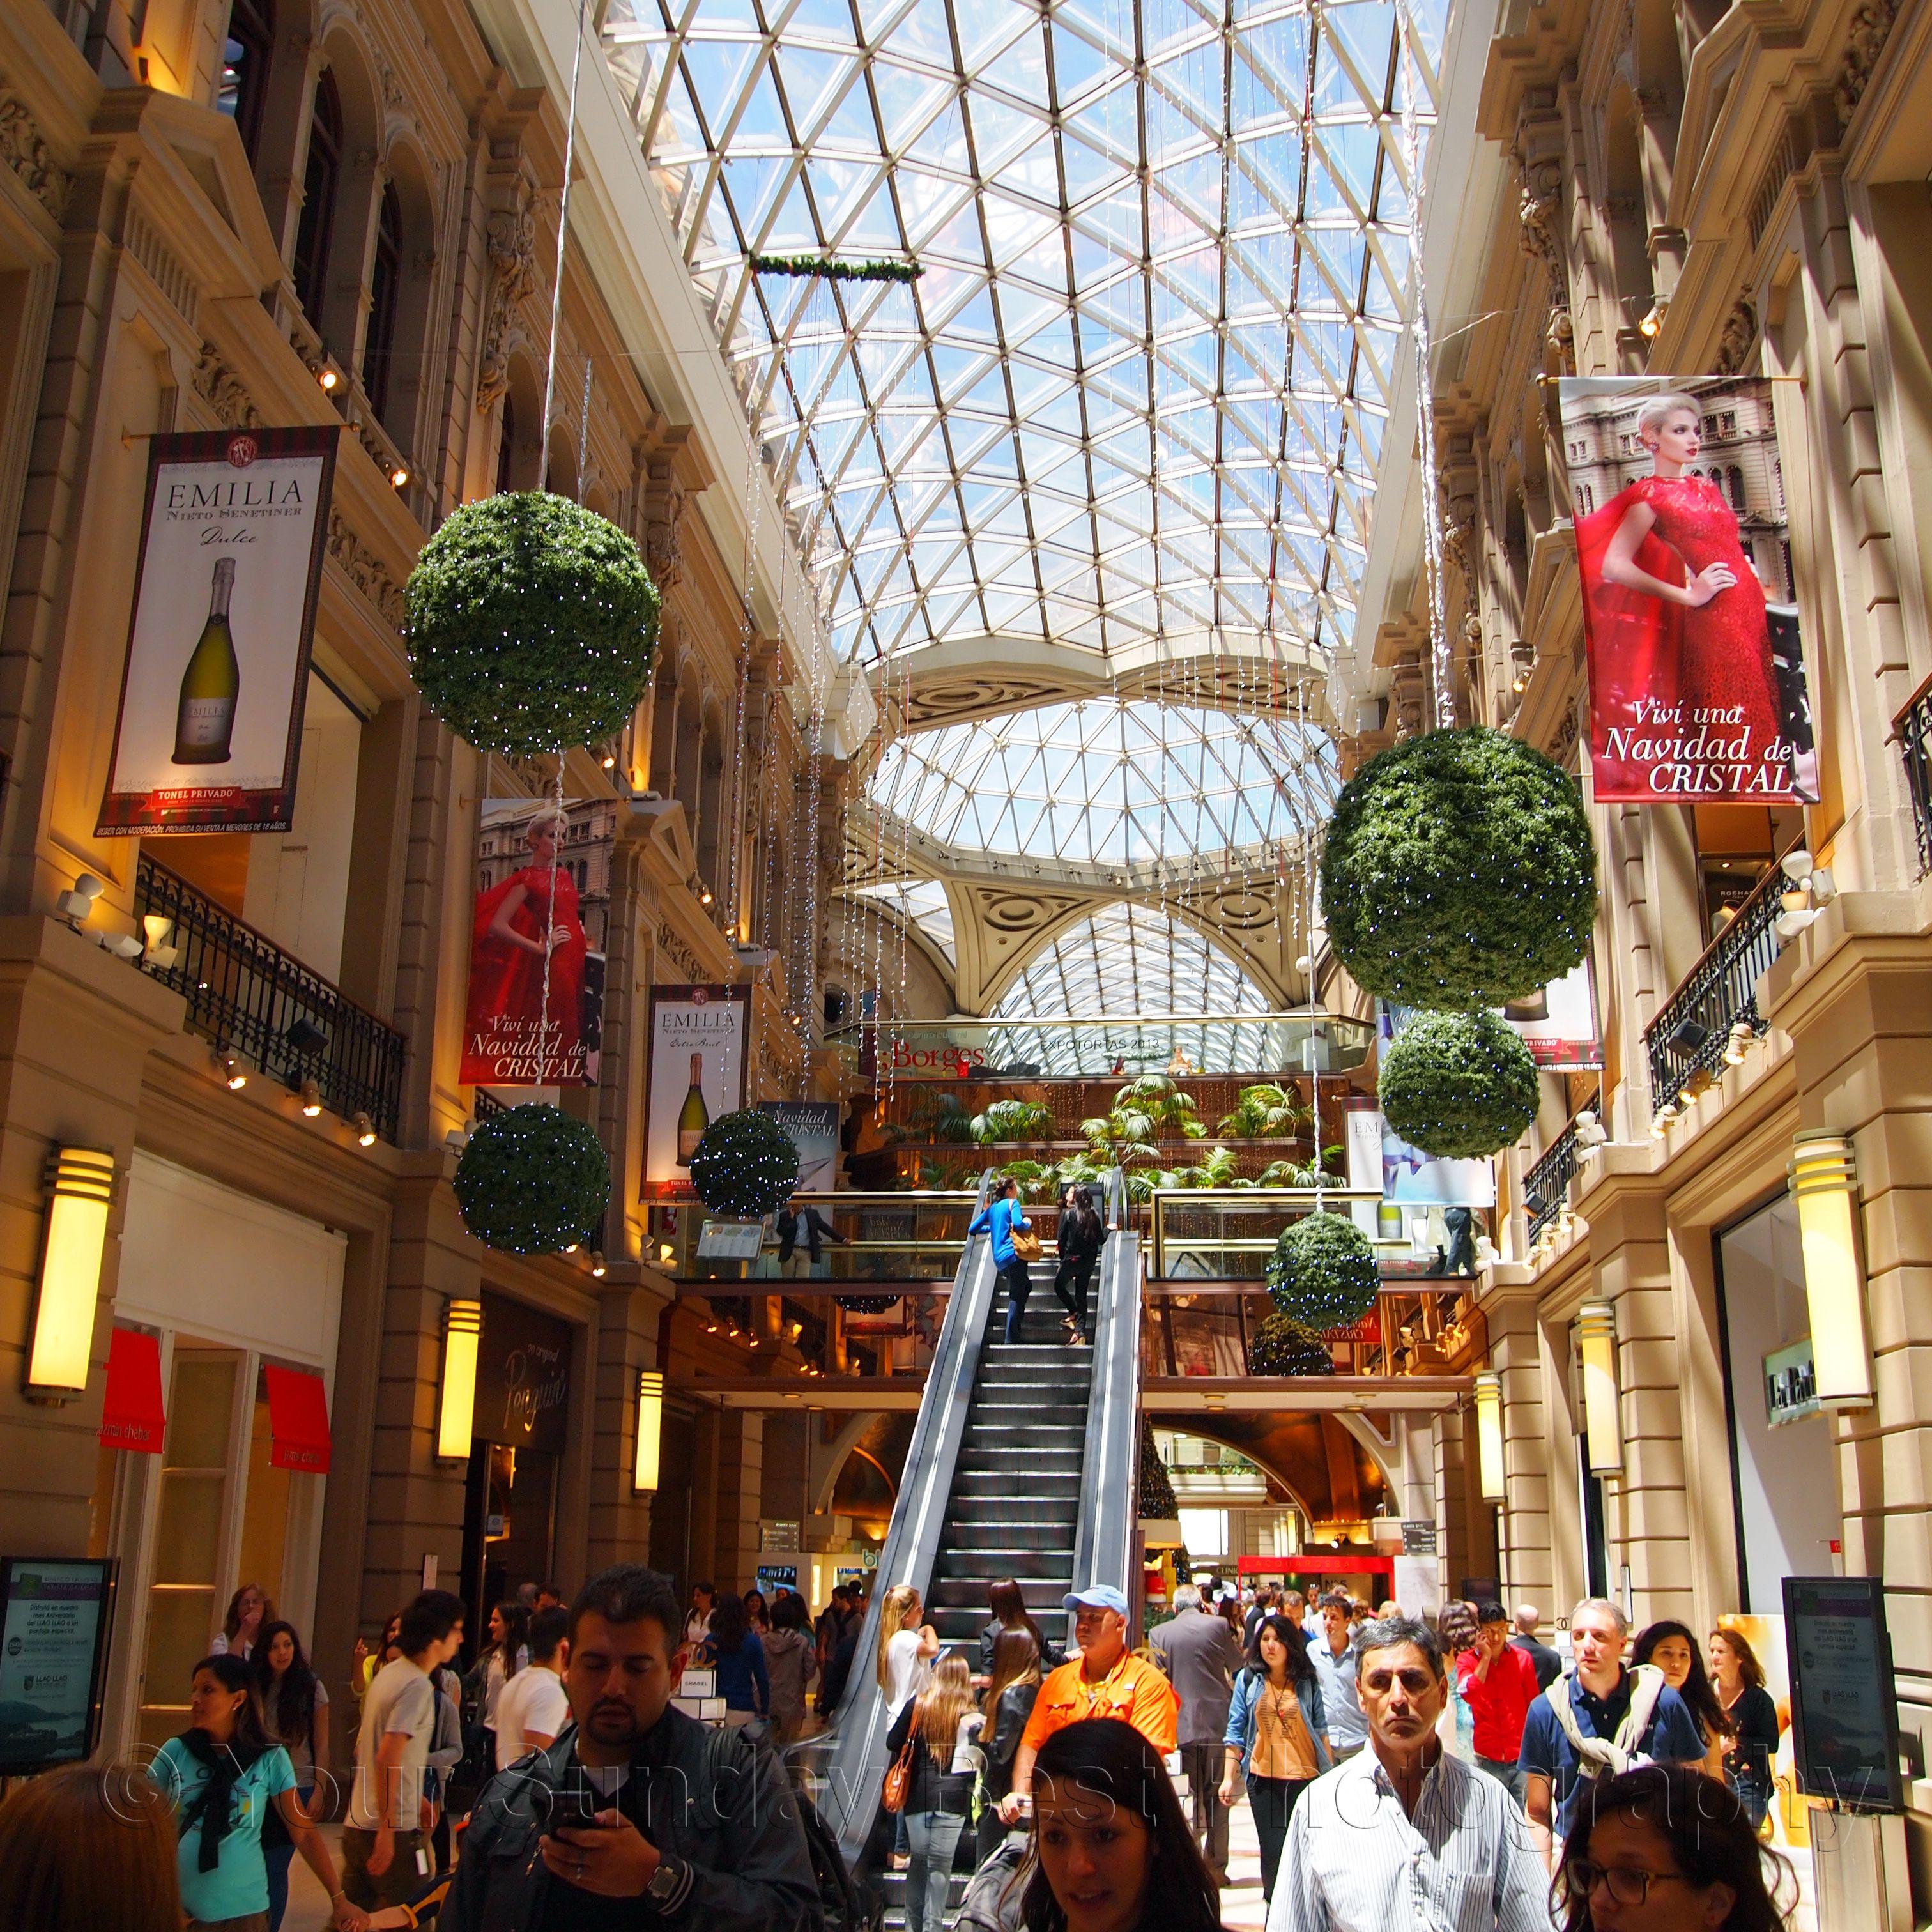 Galerias Pacifico: Galerías Pacífico Is A Shopping Centre In Buenos Aires